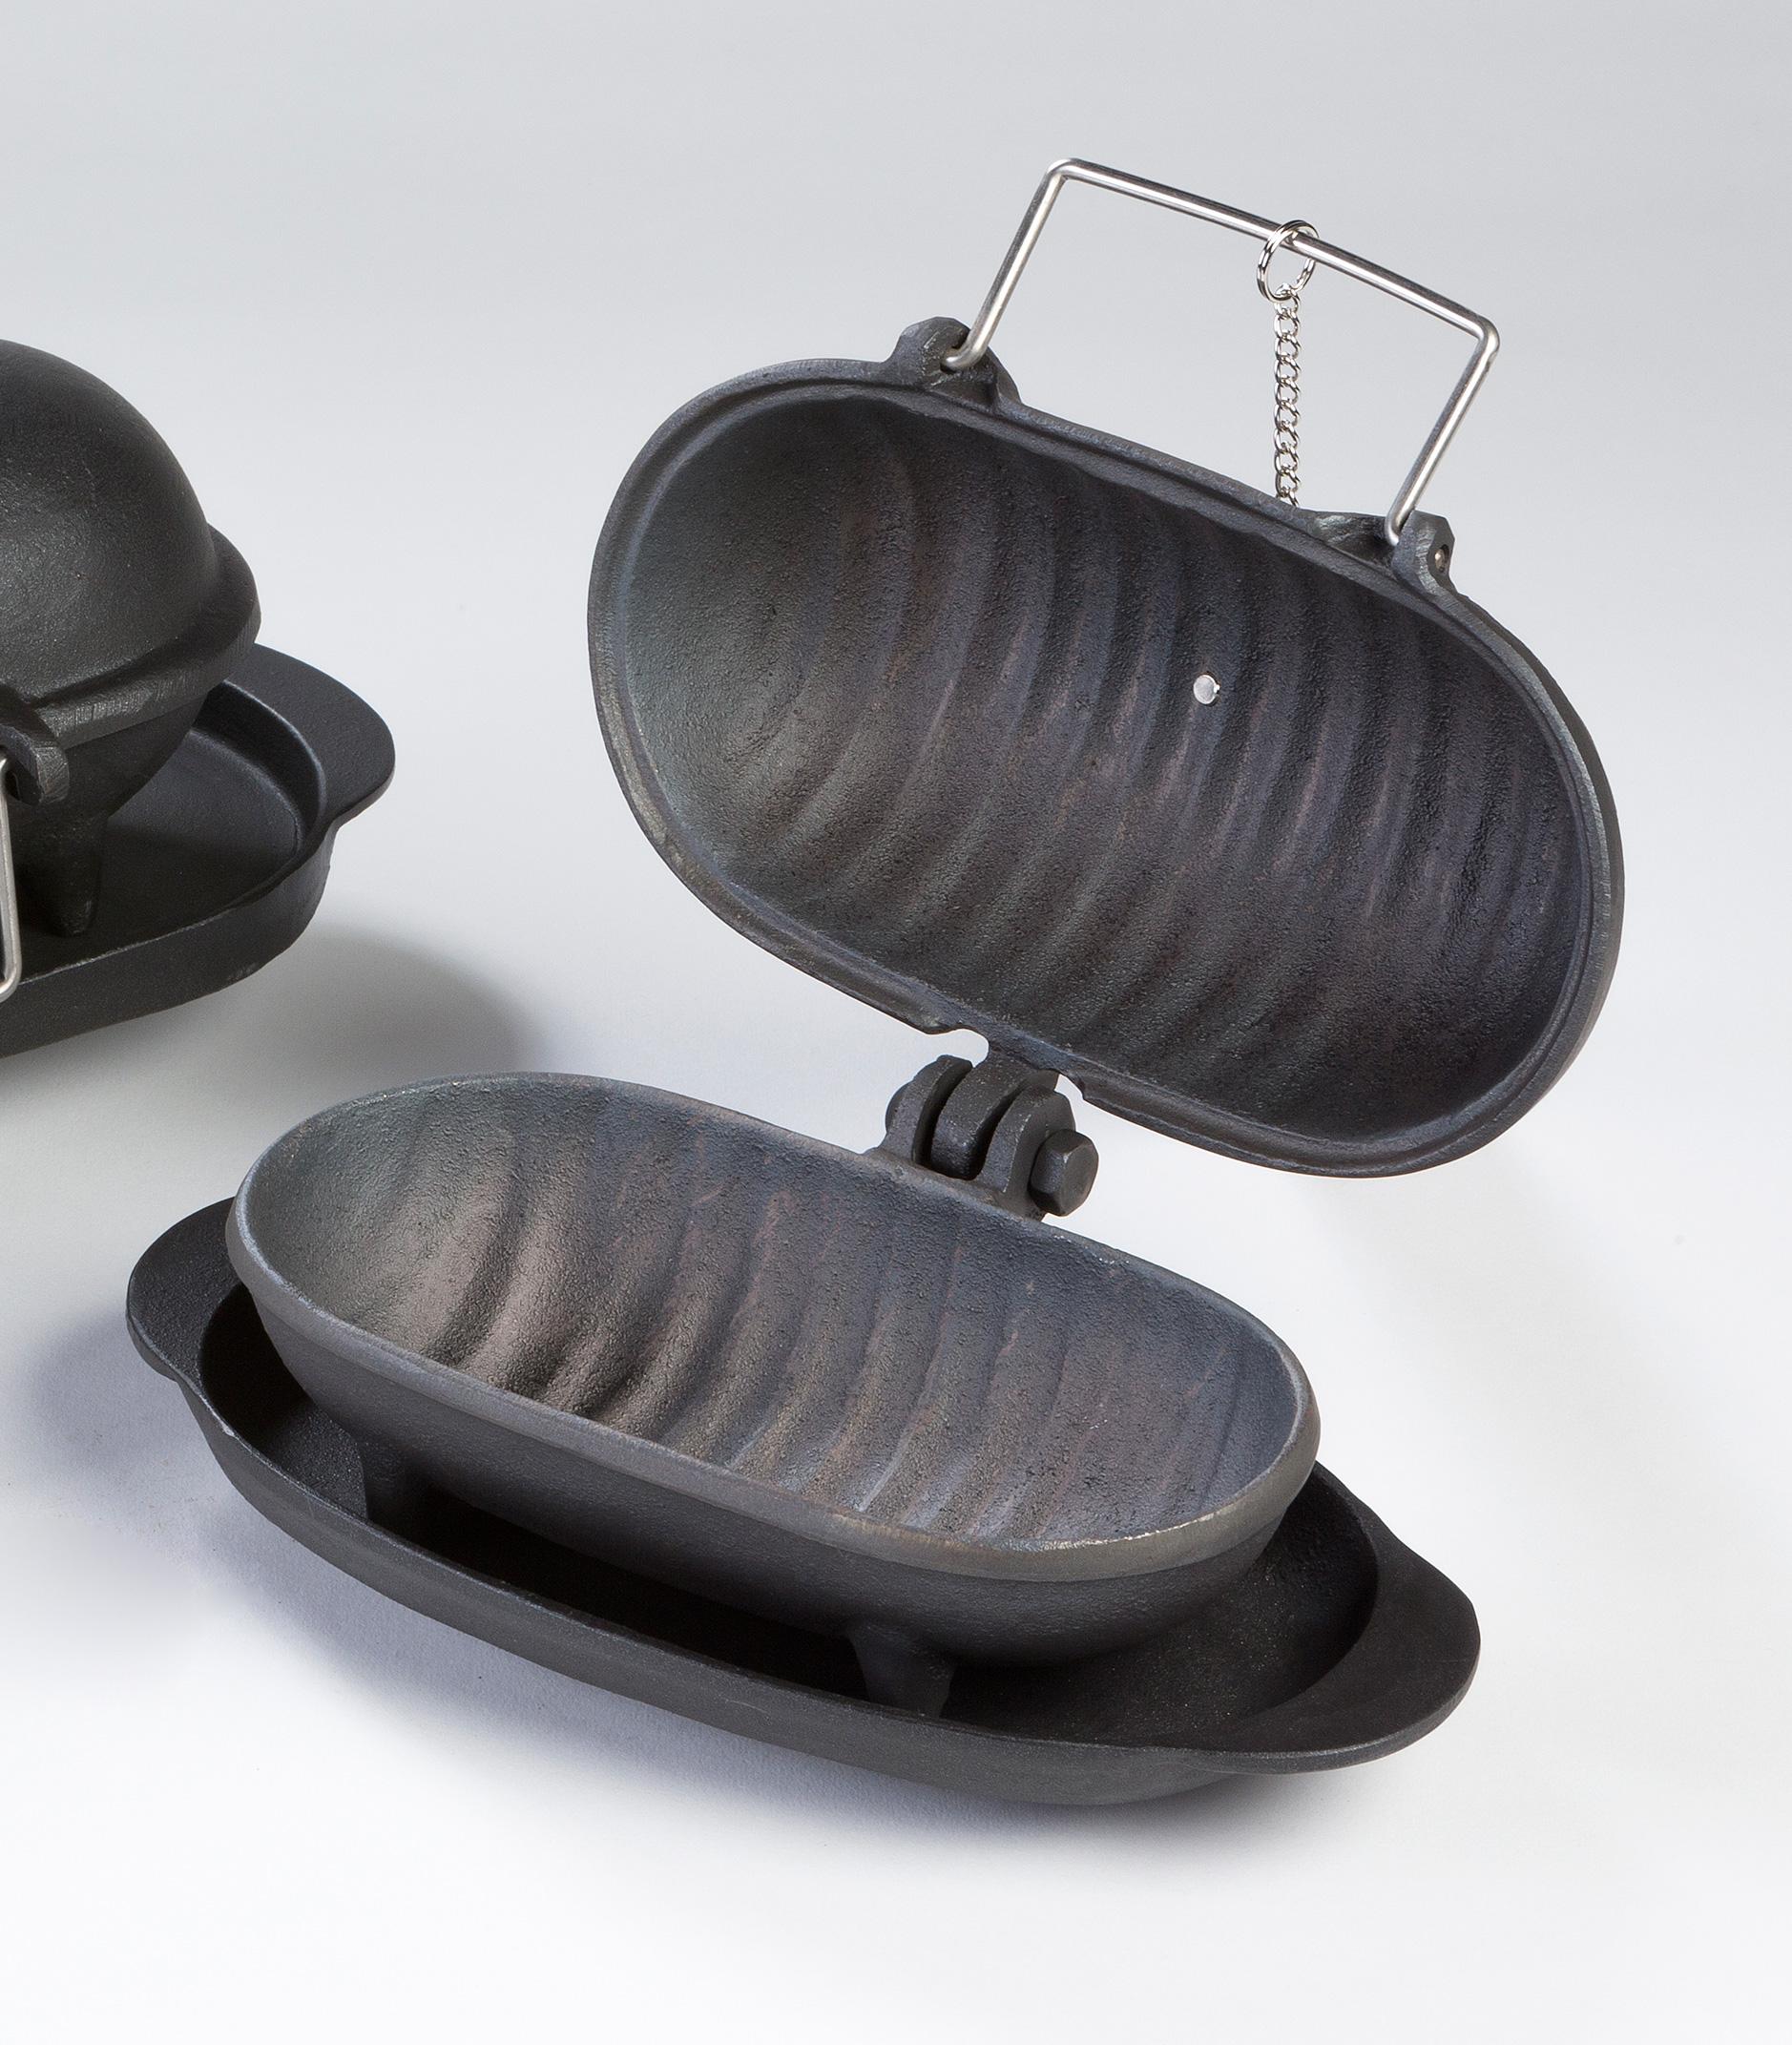 Gusseisen Back/Kochaufsatz Thera Fine cooker S Globe-fire 20x10x12 Bild 1